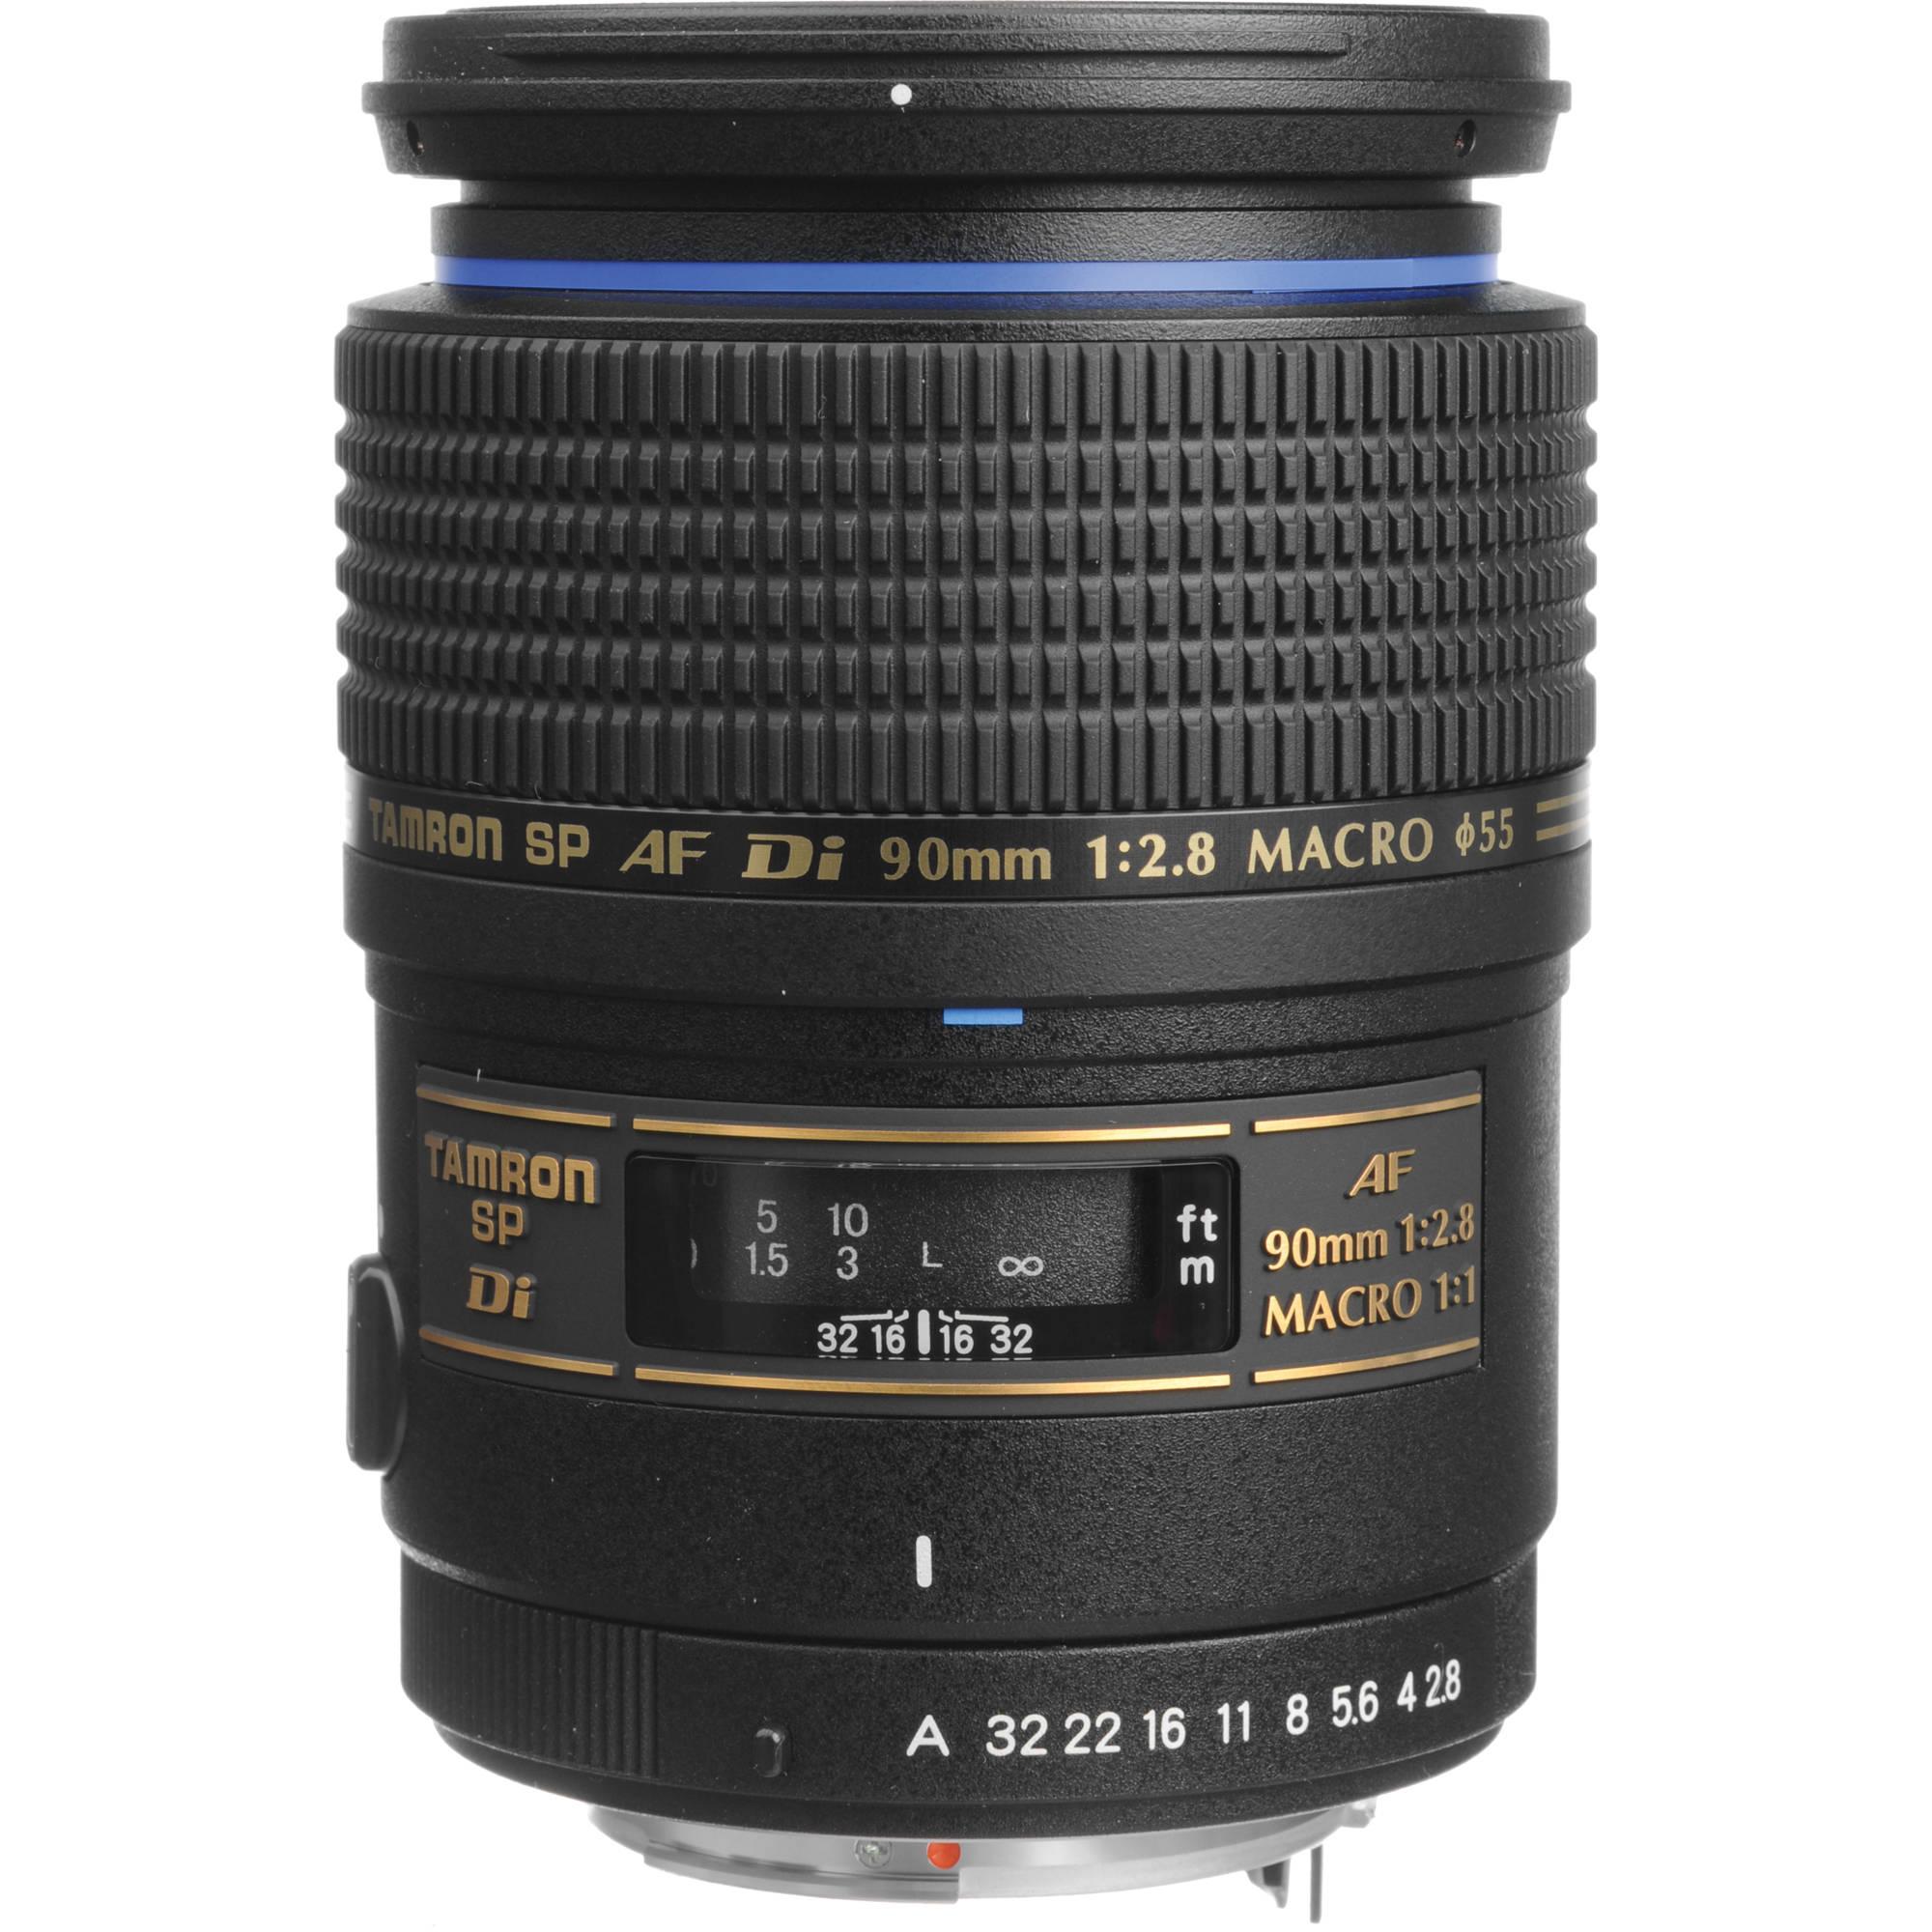 Tamron SP 90mm f/2.8 Di Macro Autofocus Lens AF272P-700 B&H